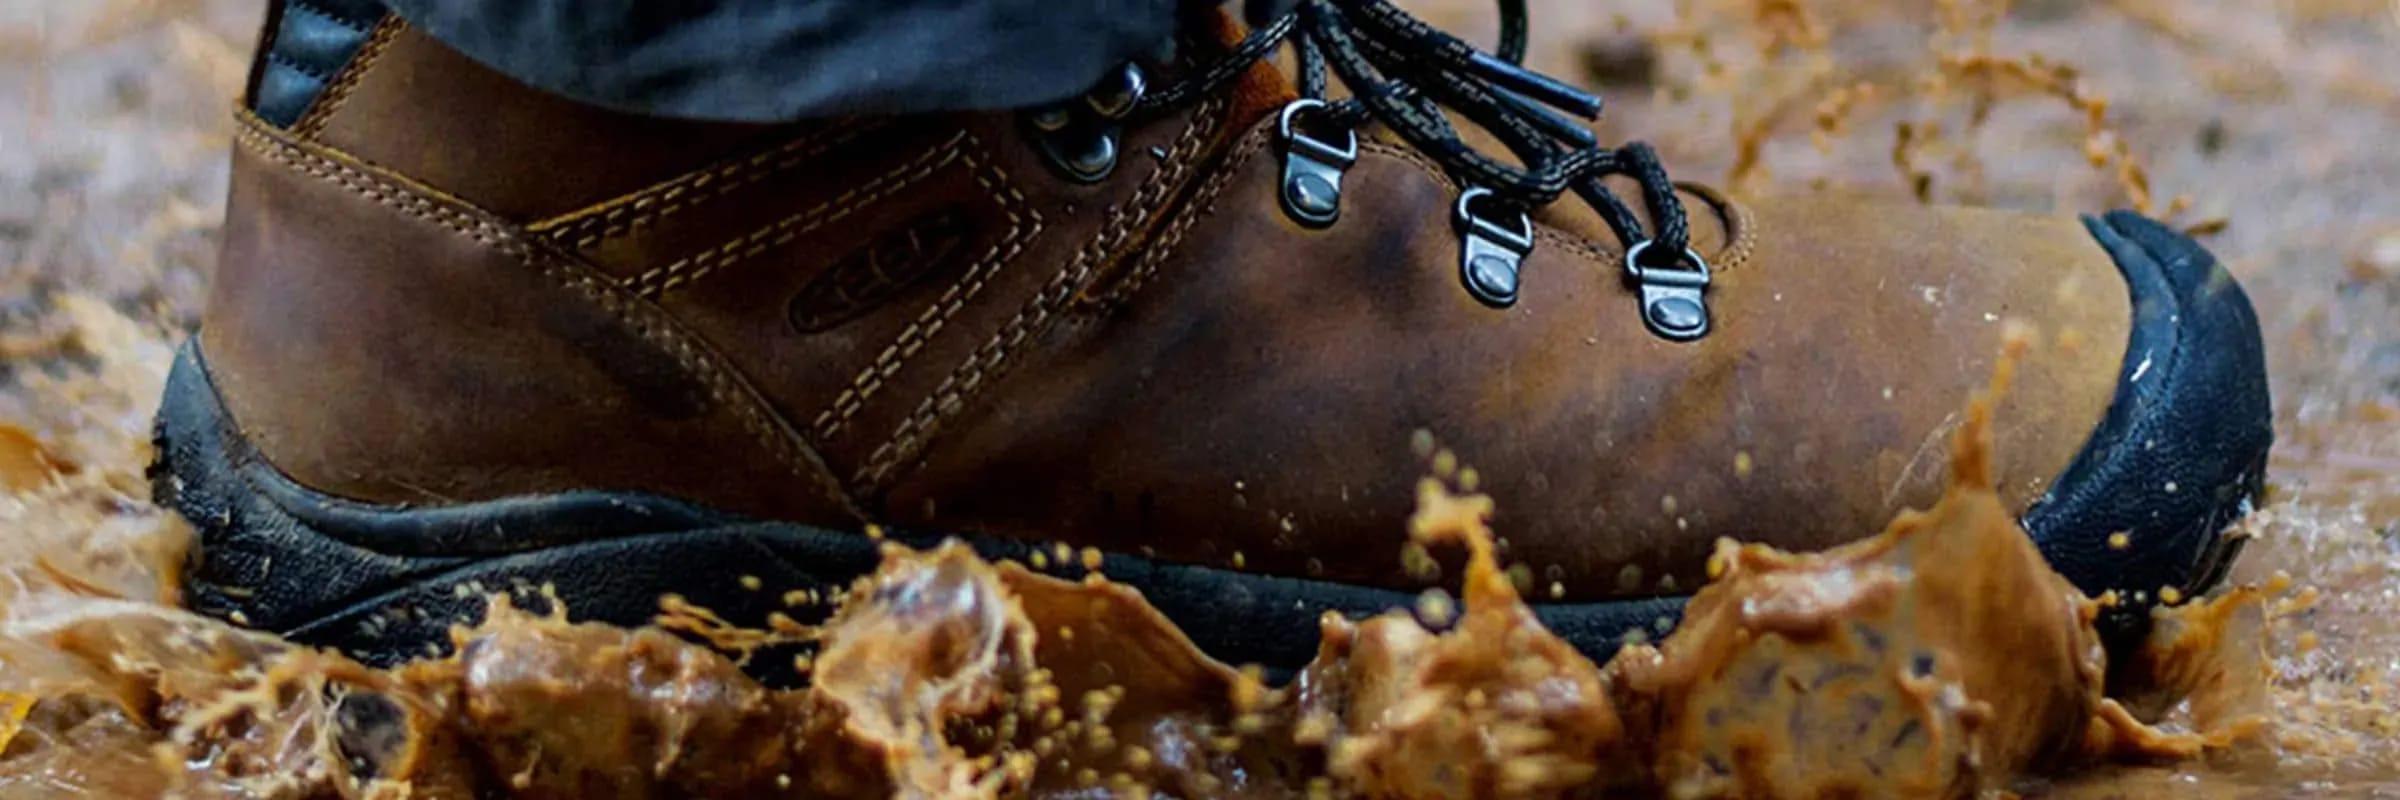 Keen Men's Pyrenees Boots Reviewed